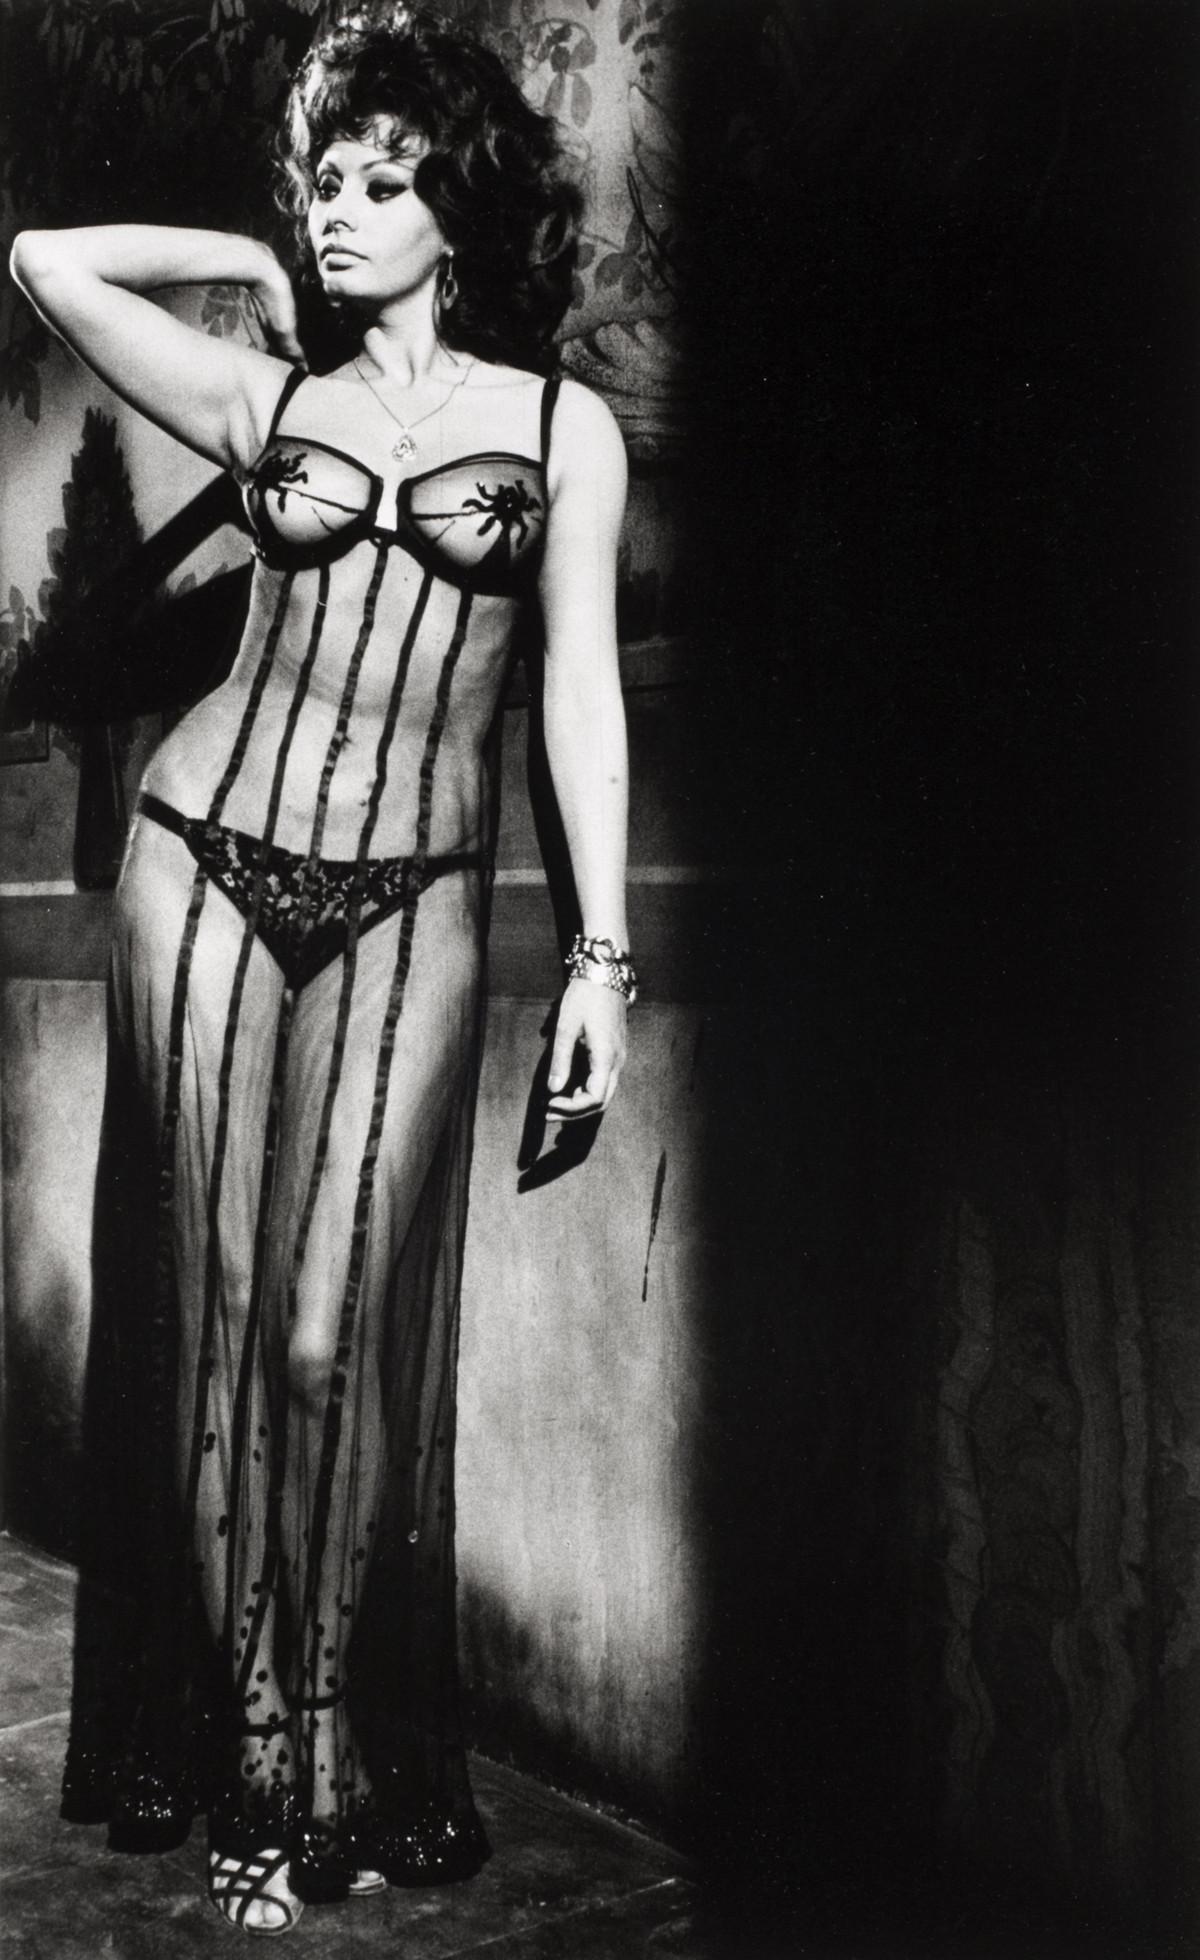 Alfred Eisenstaedt photos of  Sophia Loren in Italian Marriage, Rome, Italy, 1964.